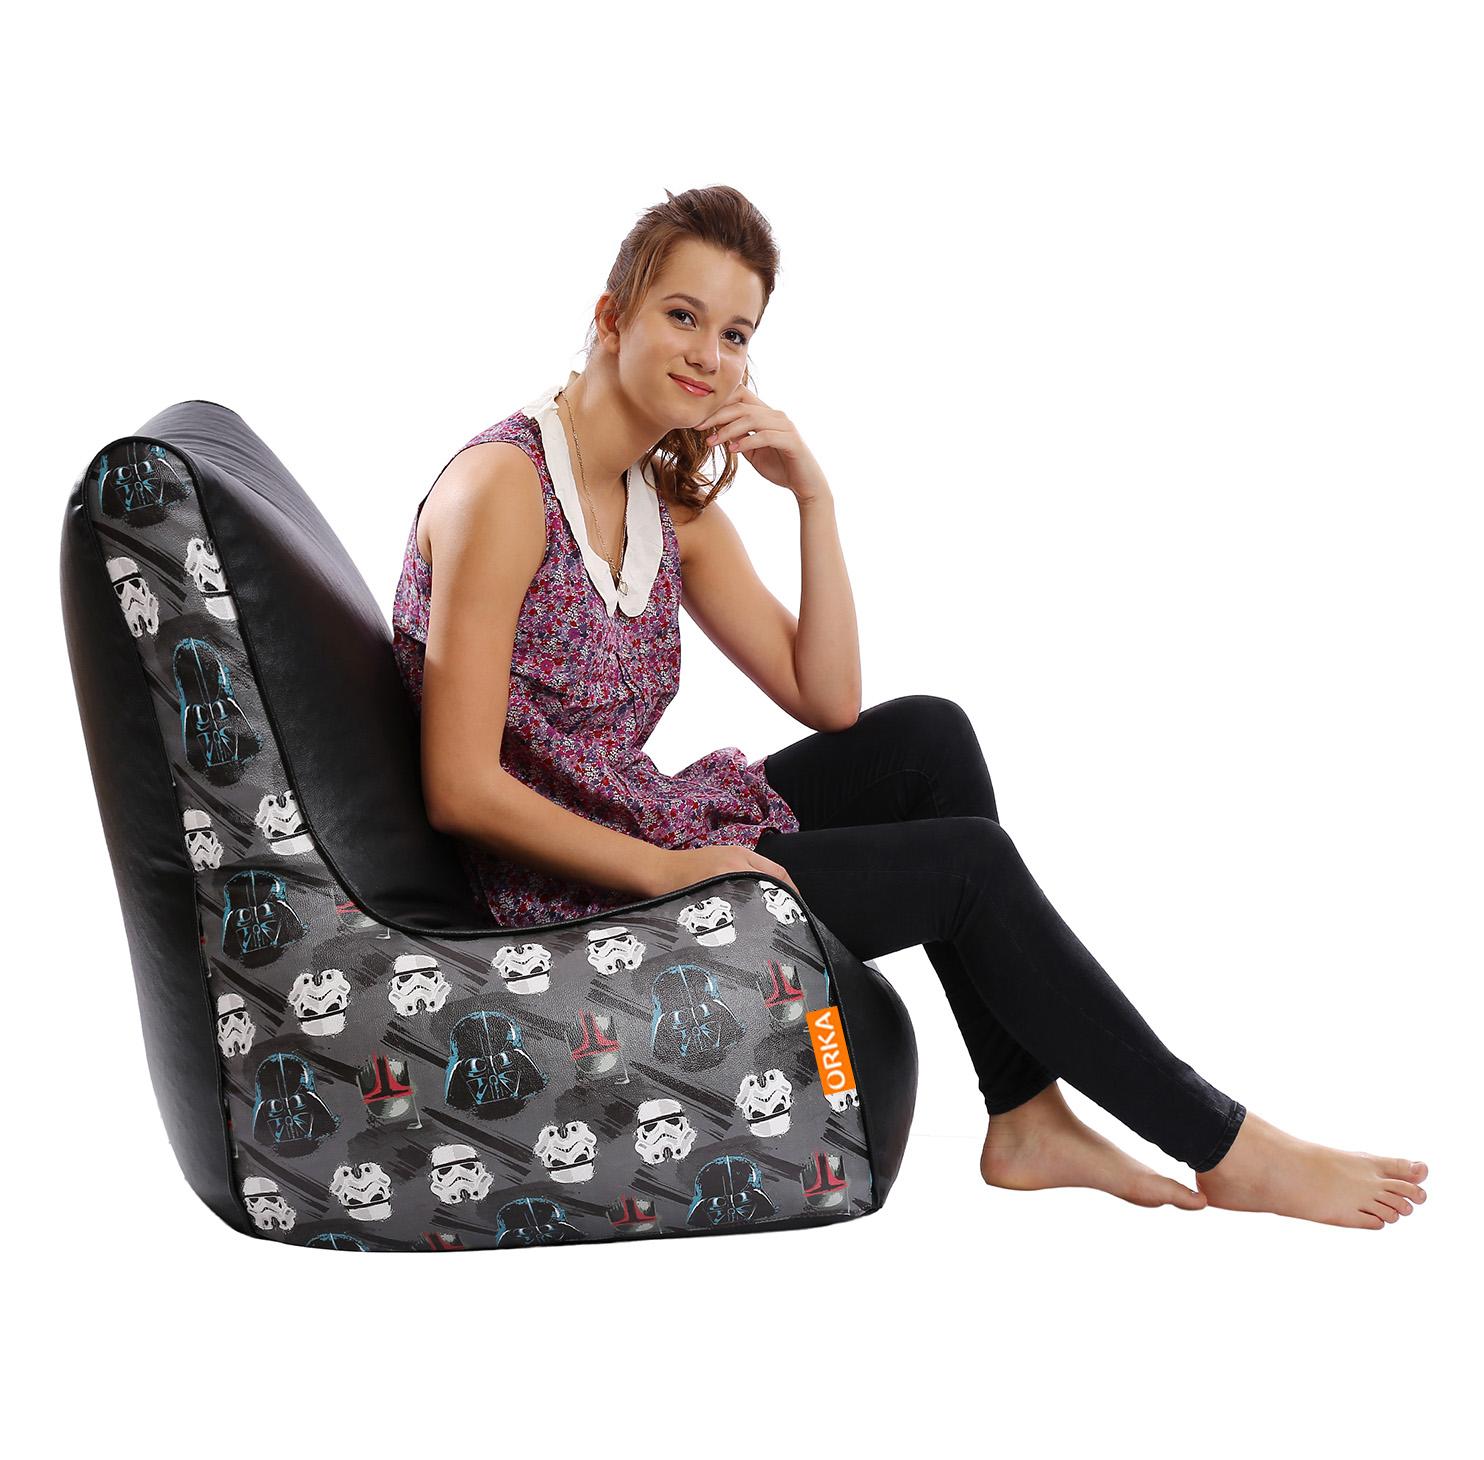 ORKA   Star Wars Dark Digital Printed Bean Chair Cover